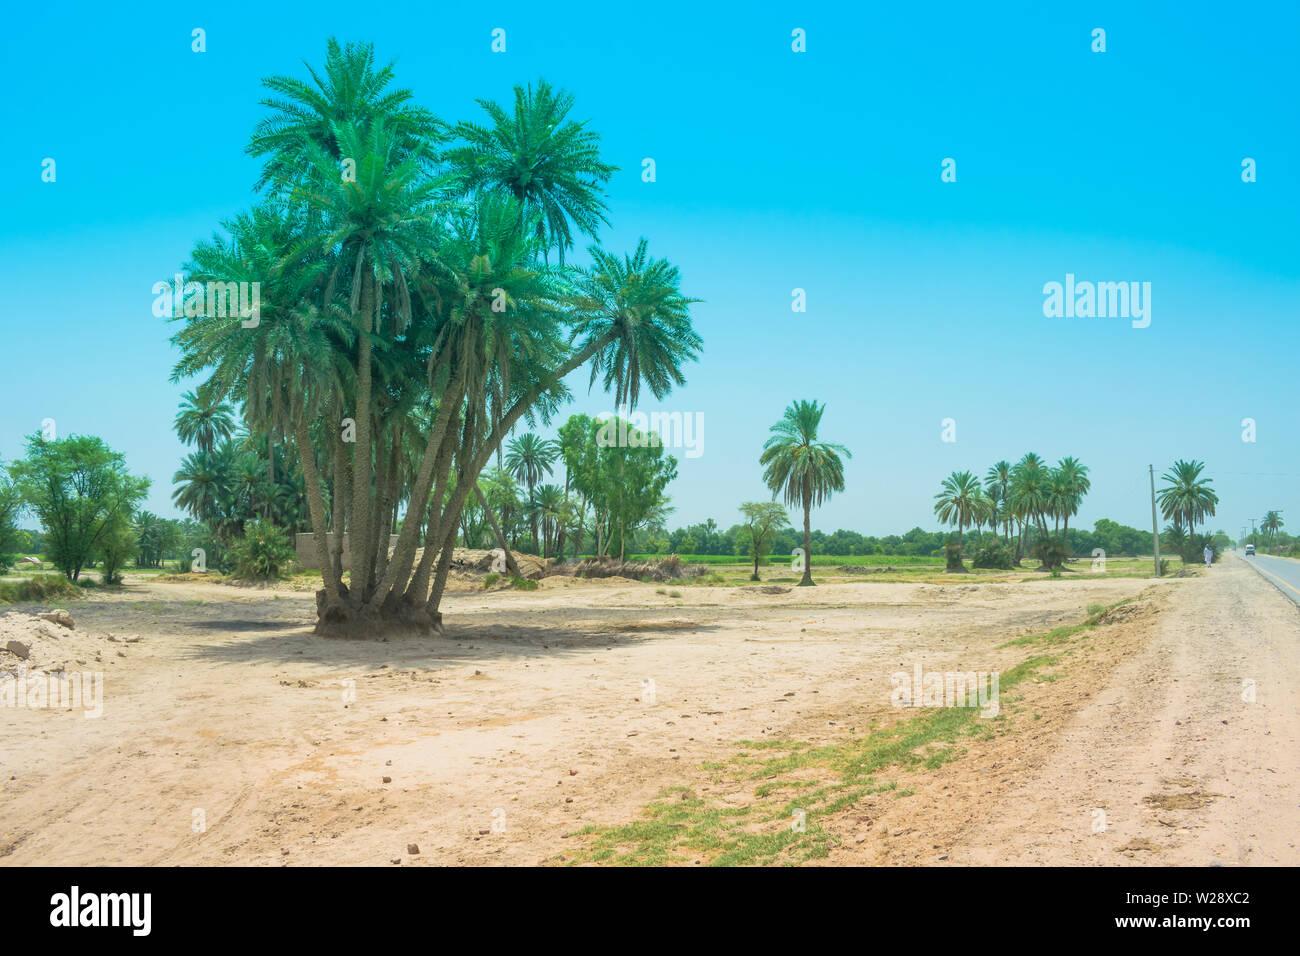 landscape of cluster of date trees in a village punjab,pakistan.date trees near a road side,pakistan. Stock Photo